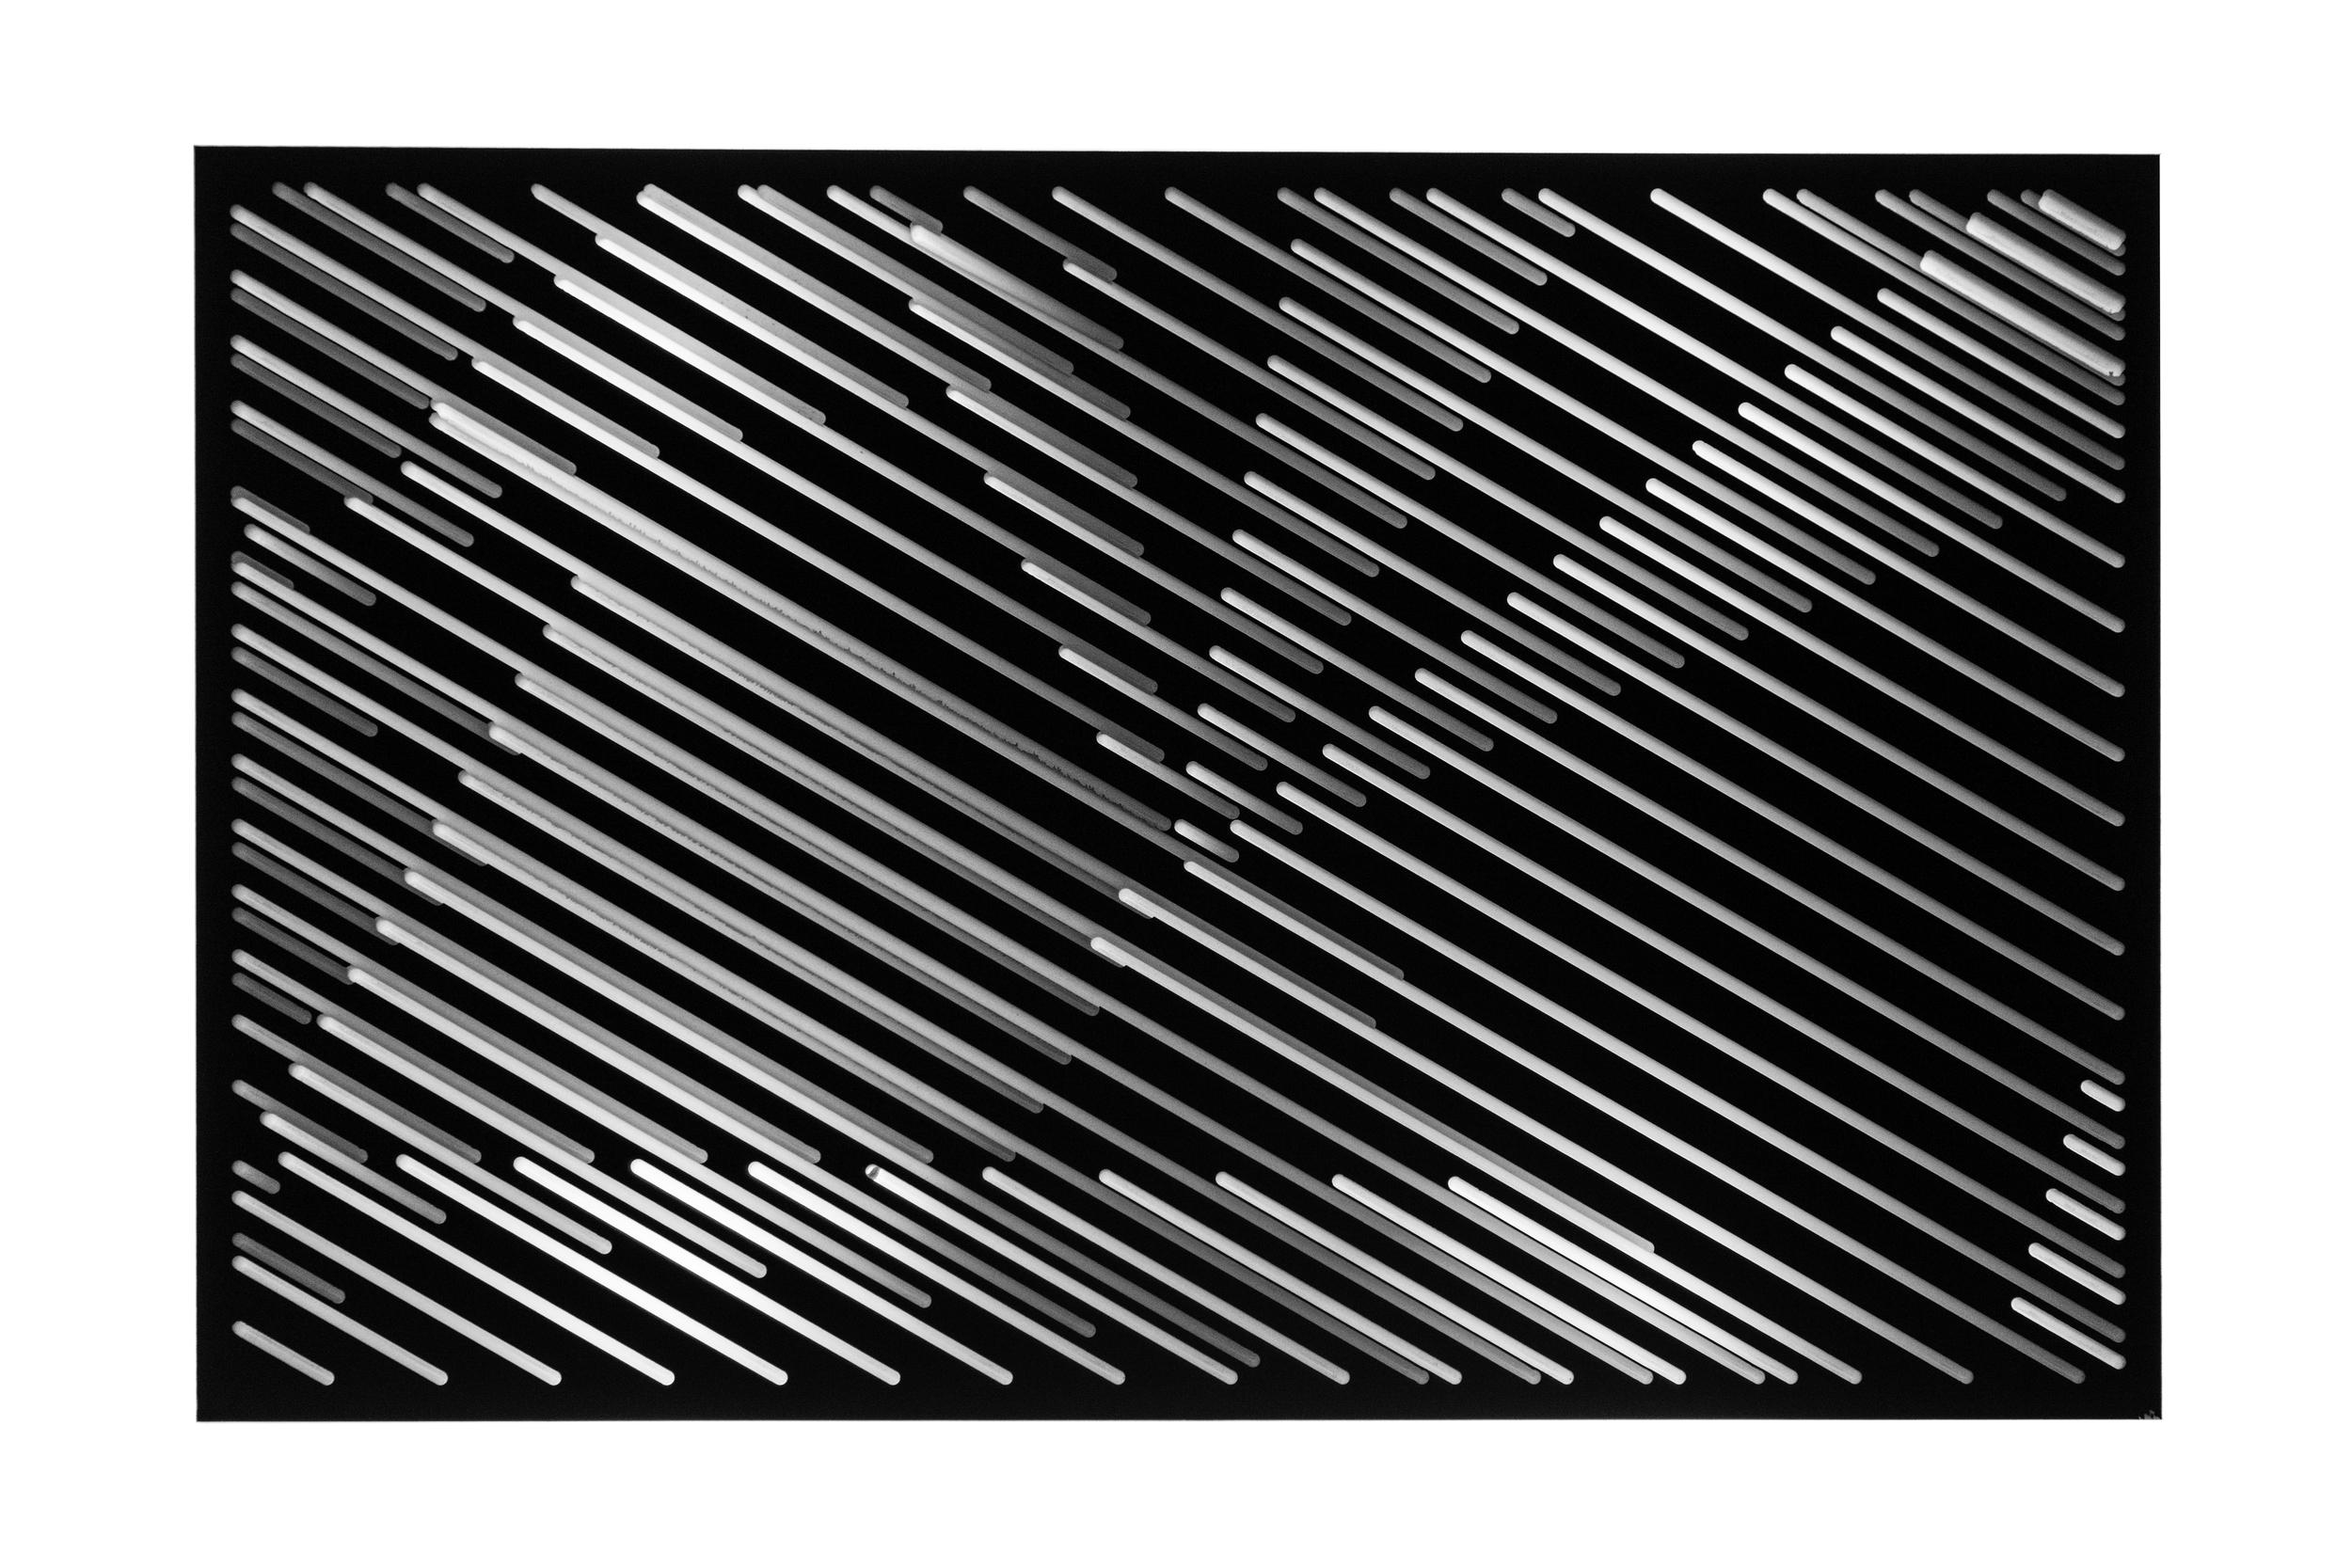 asteriskos-design-fabrication-cnc-art-solid-surface-graphic-pattern-light.jpg